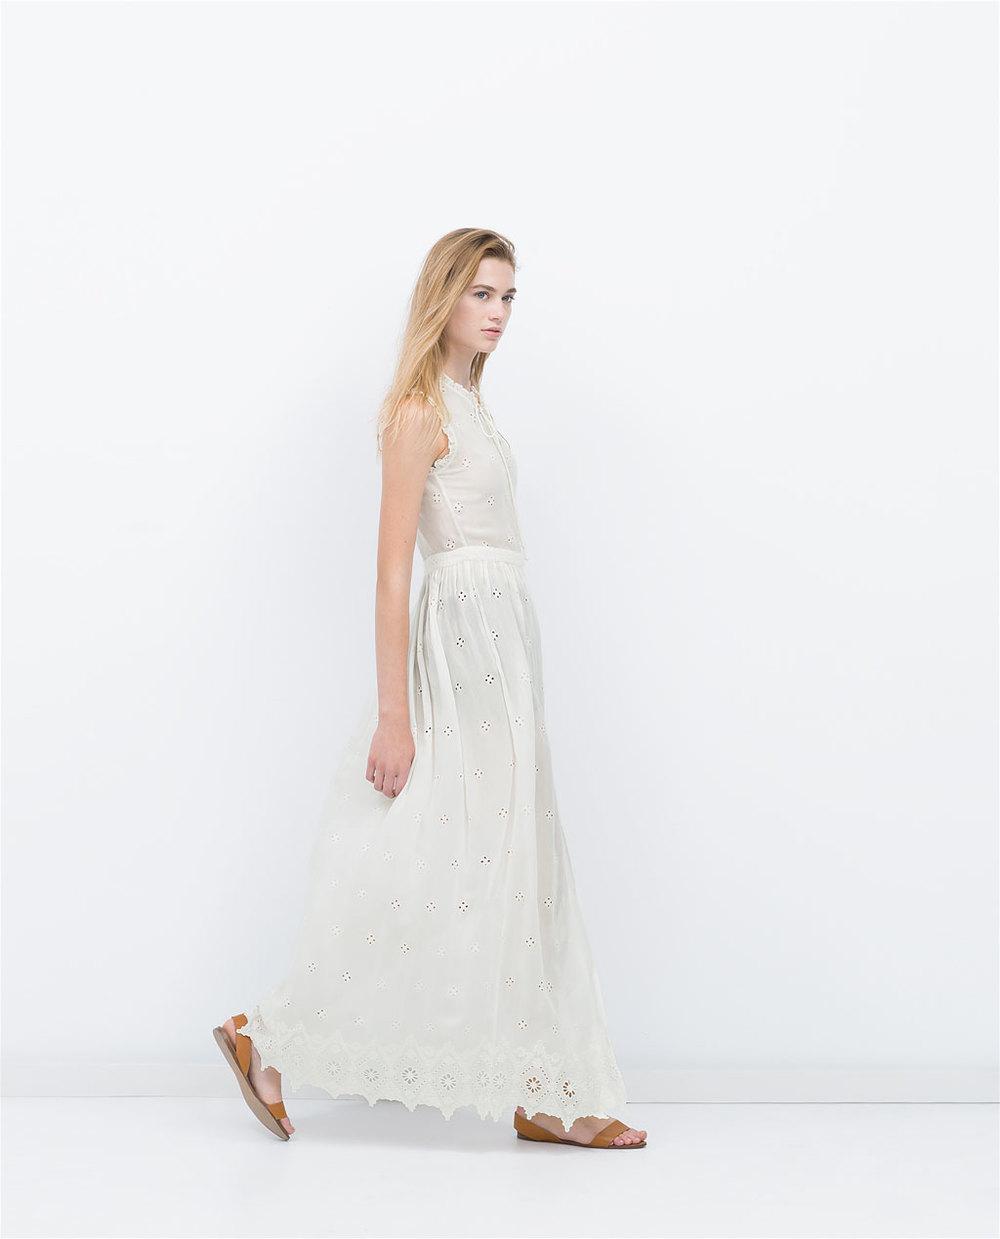 EYELET DRESS 49.99 USD